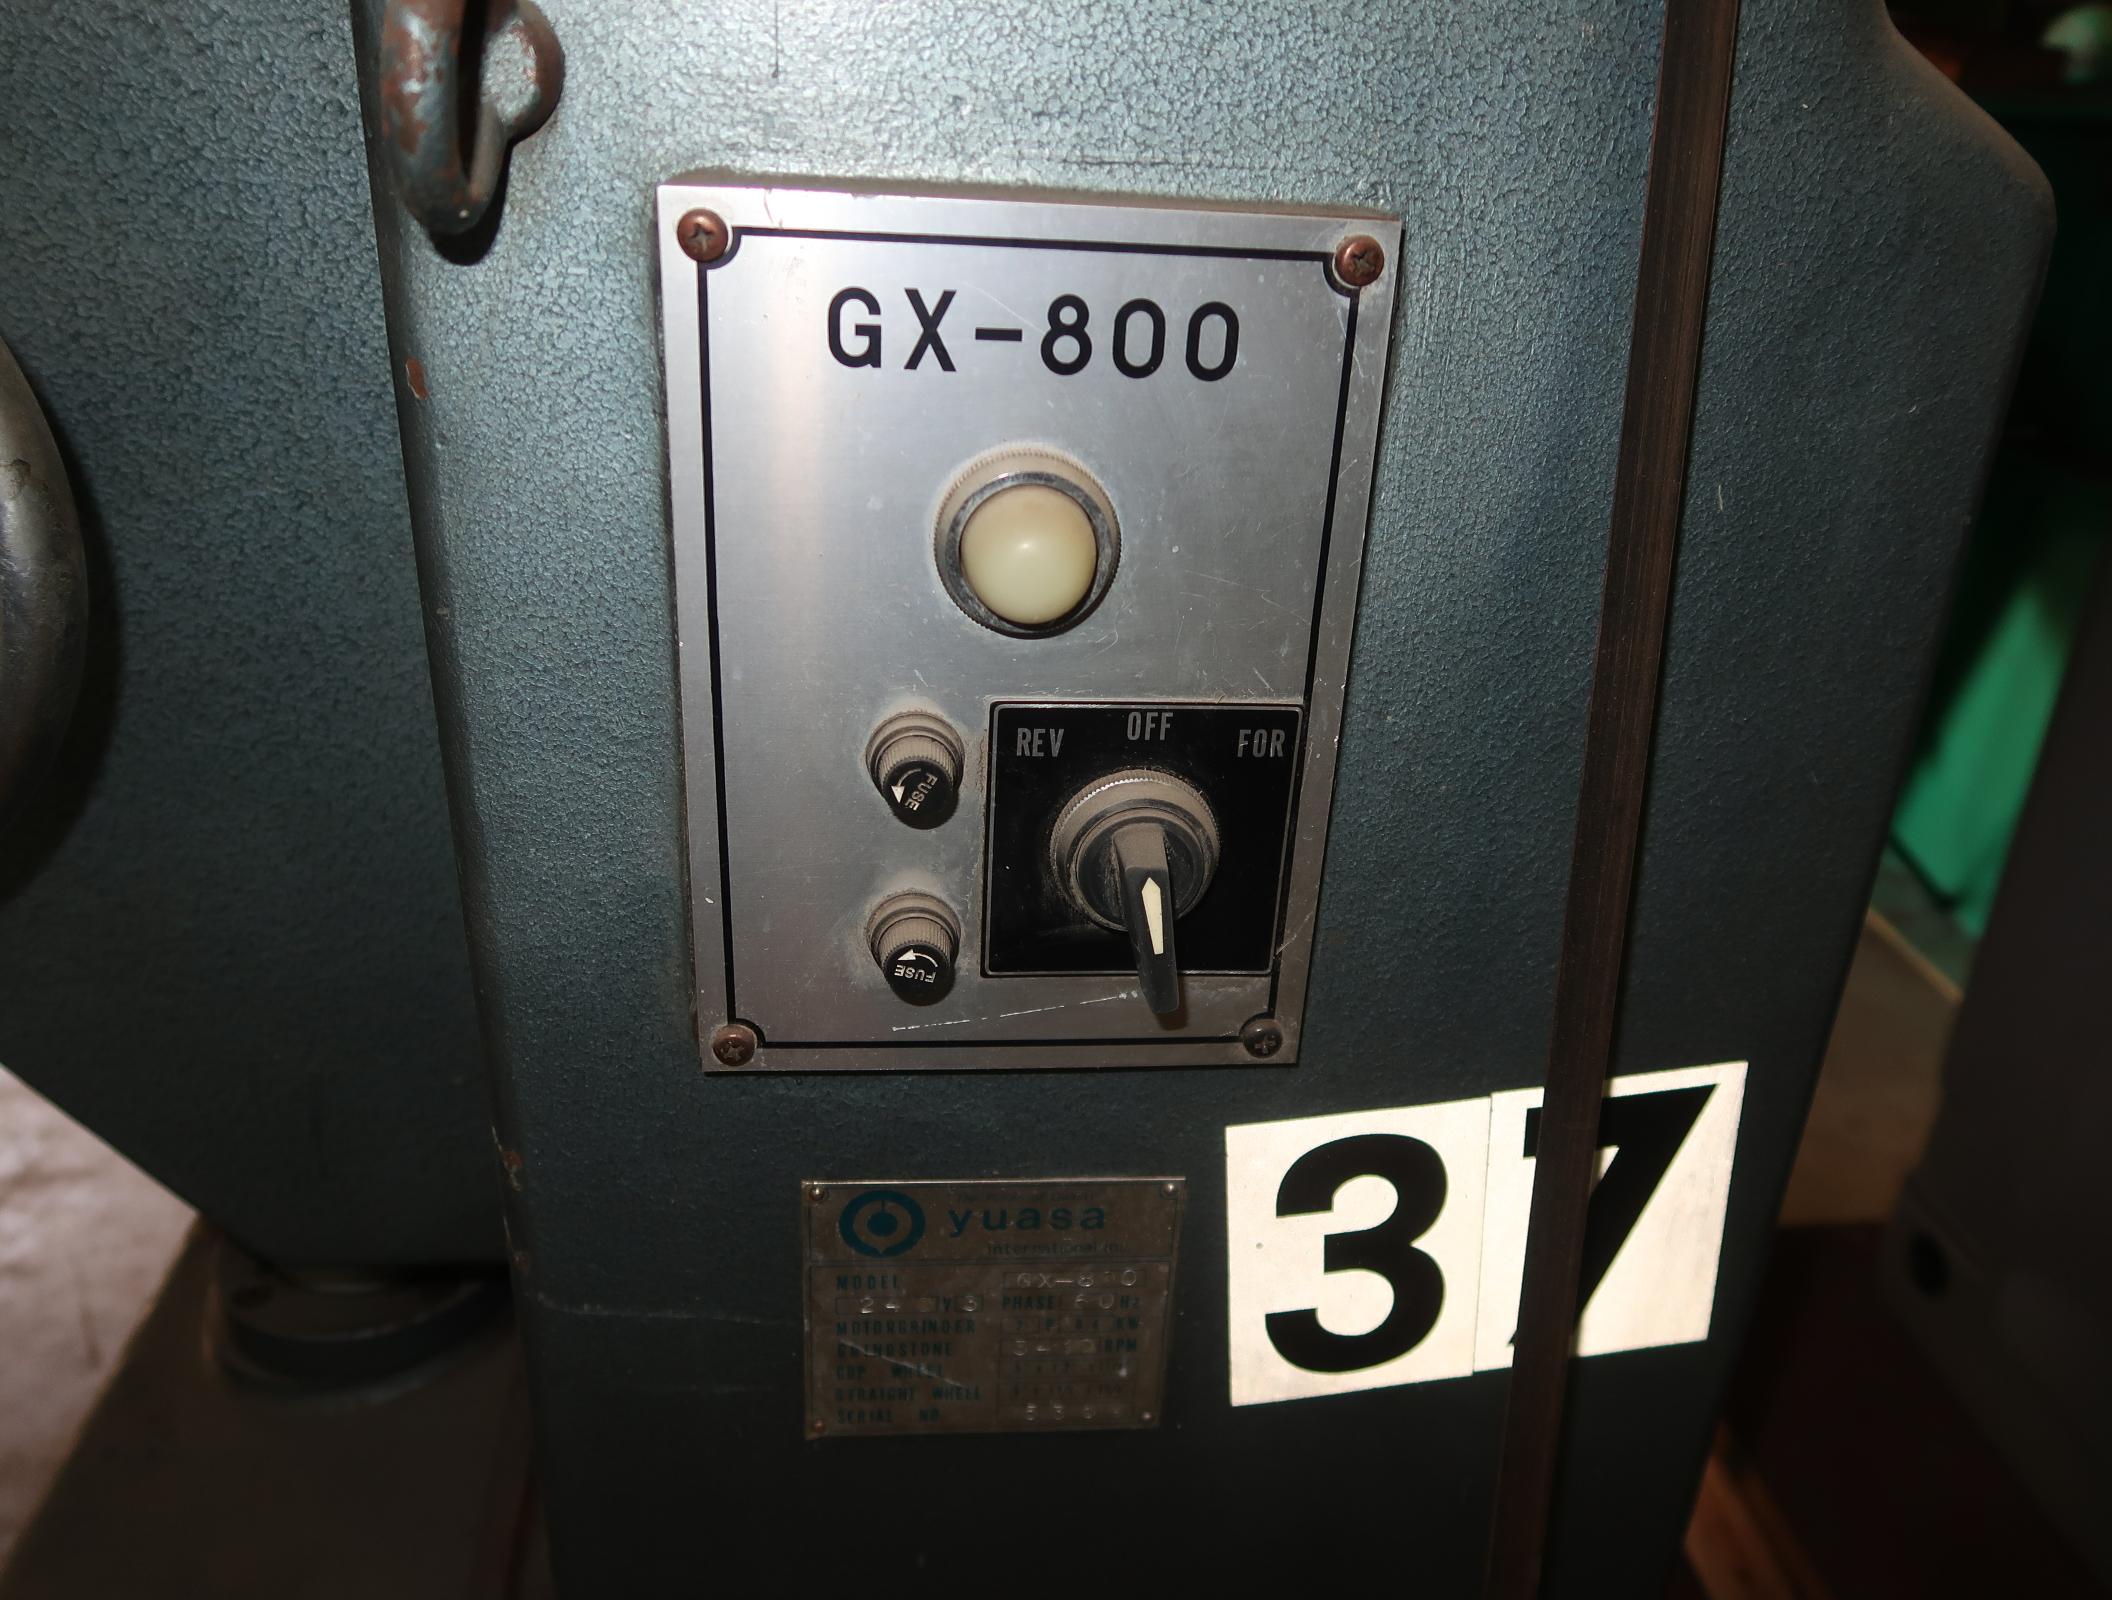 YUASA TOOL ROOM GRINDER MDL GX-800 SN. 5359 - Image 3 of 4